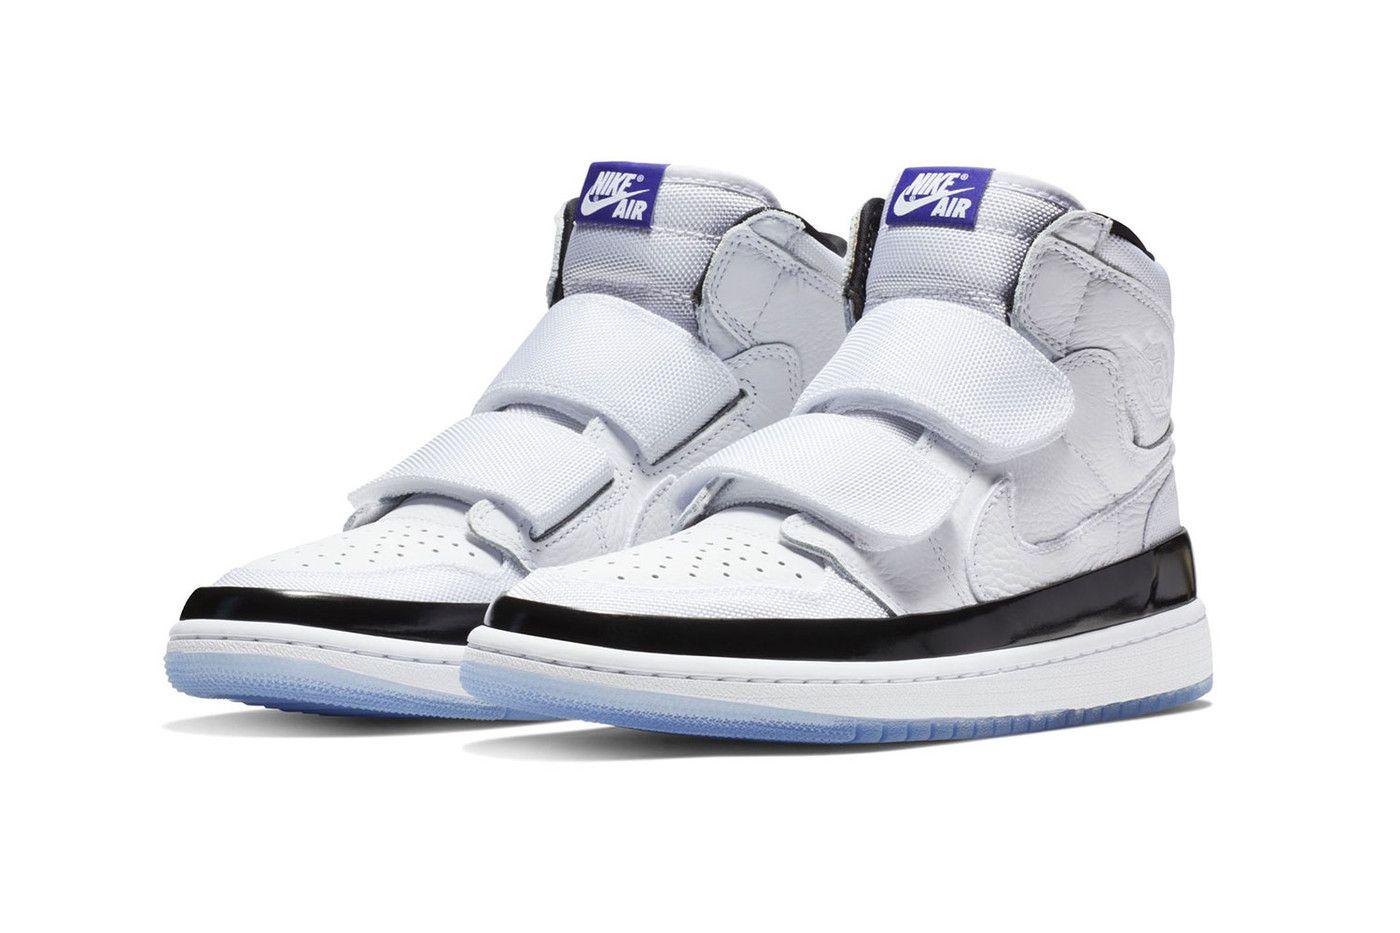 Jordan Brand's Air Jordan 1 High Double